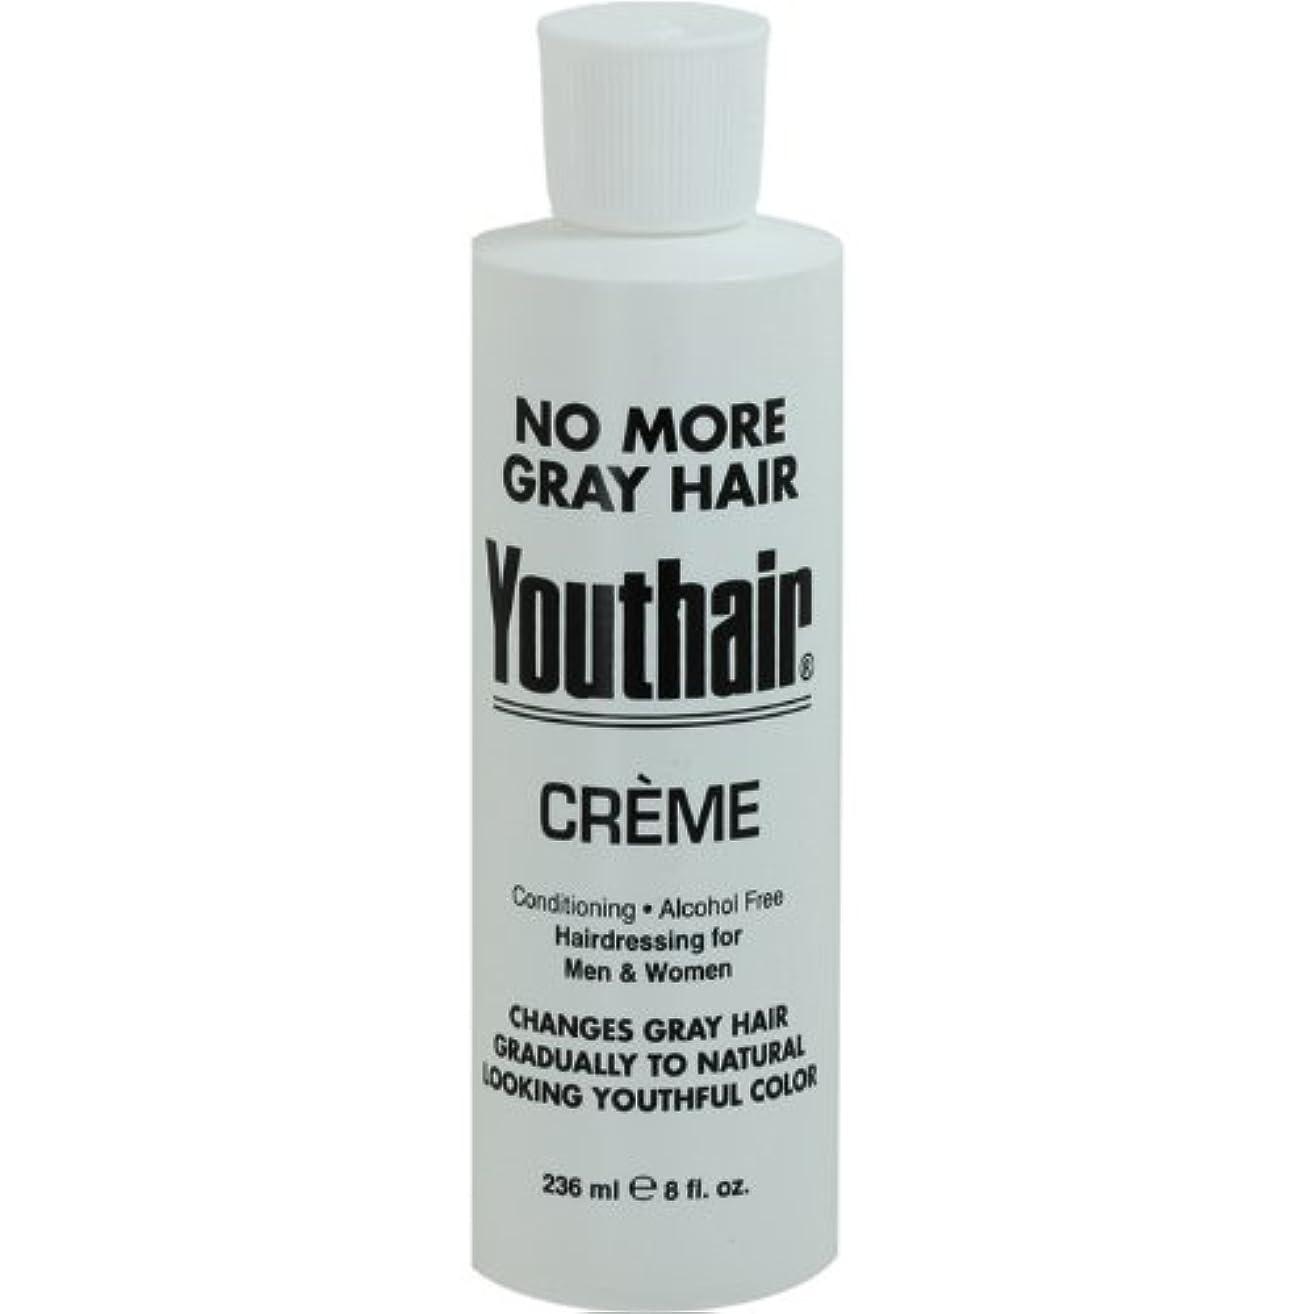 撤退松明辞任Youthair Creme, Round Bottle, 8 Ounce by Youthair